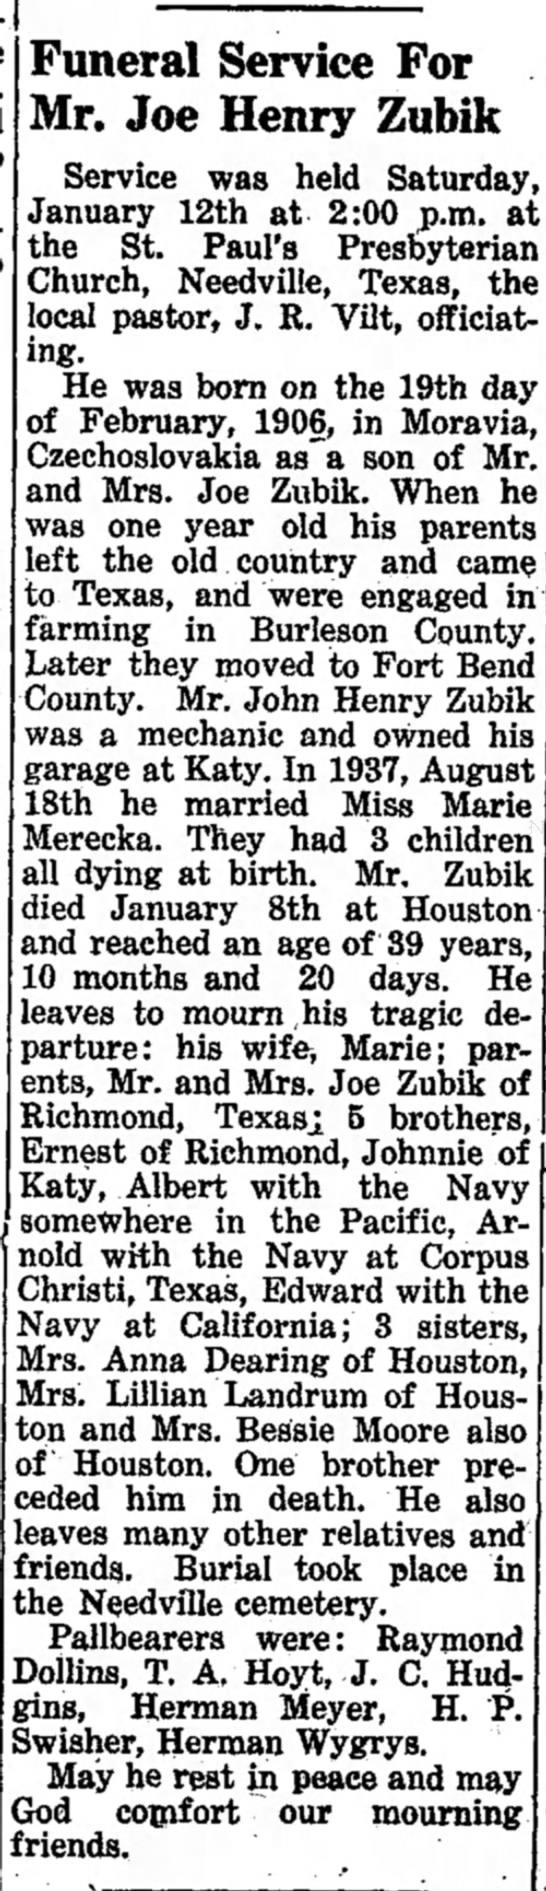 Funeral Service for Joe Henry Zubik - 1946 -